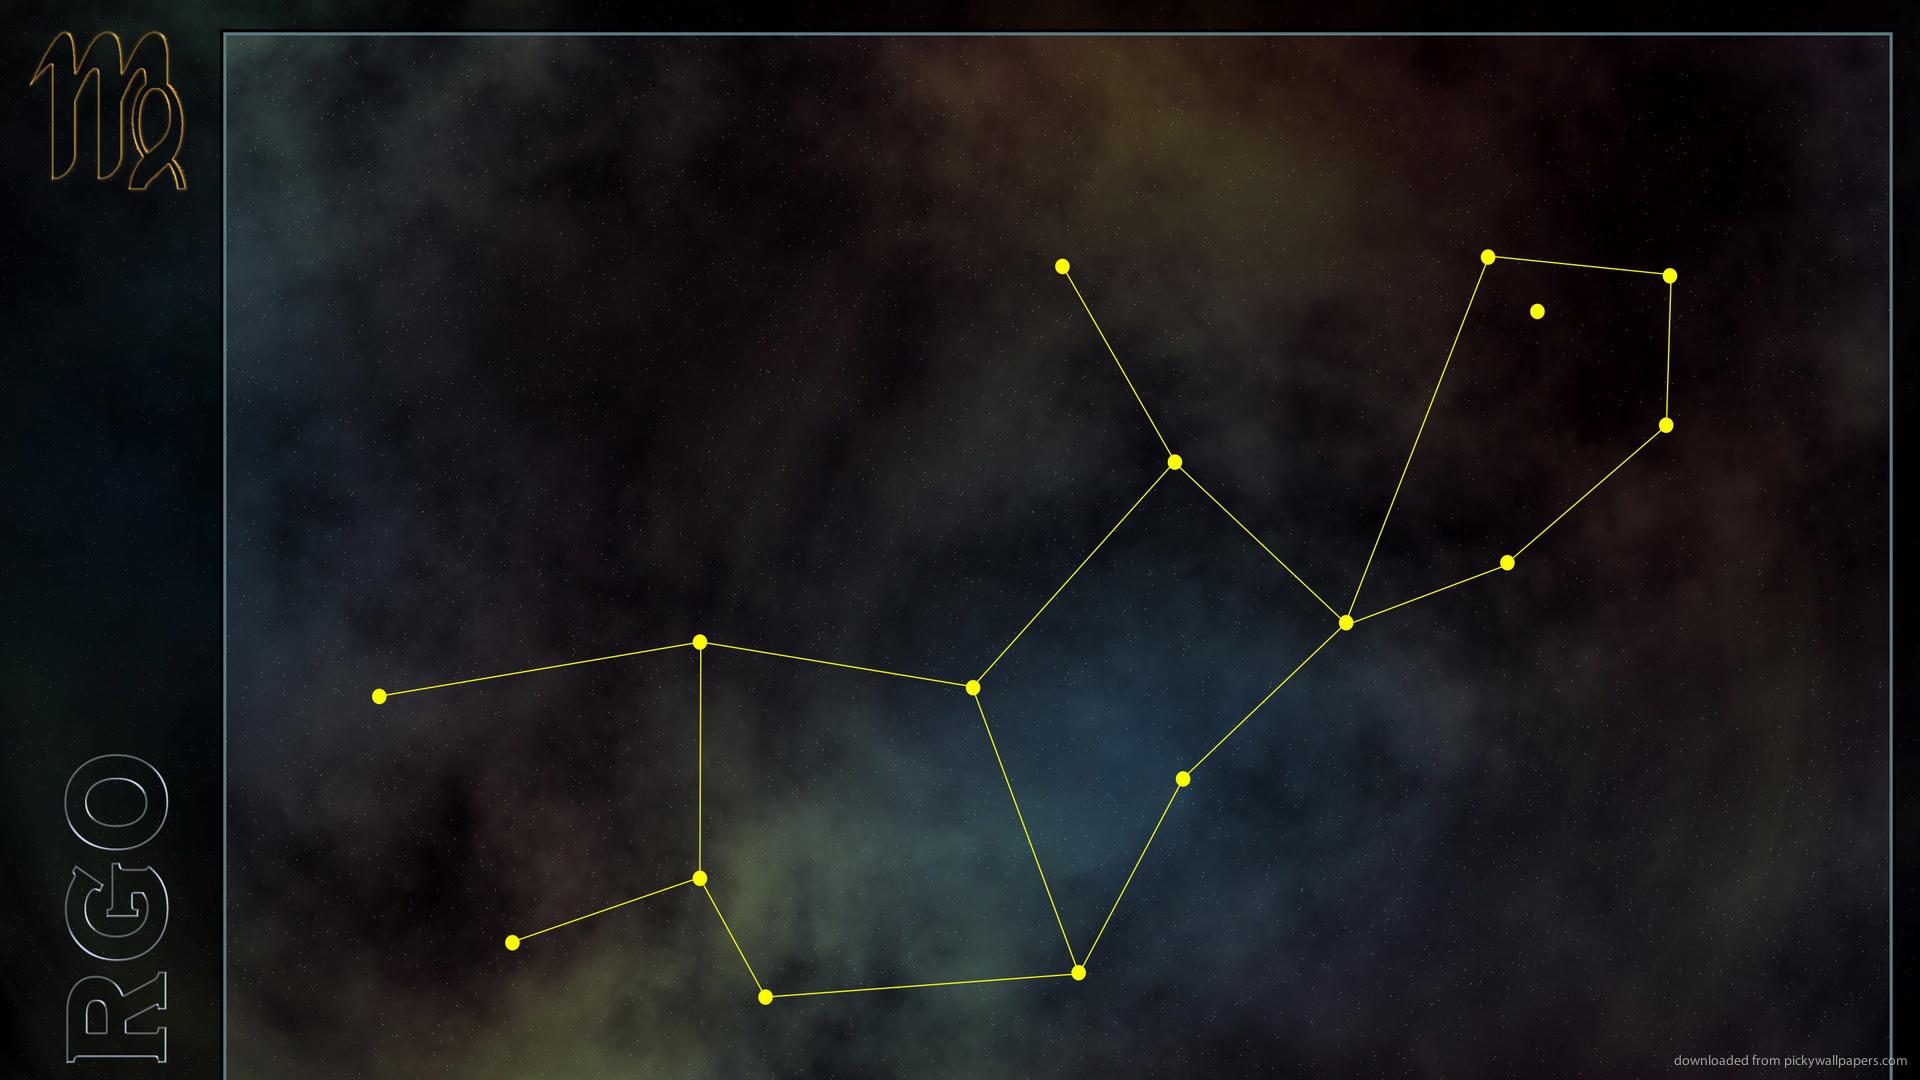 Widescreen Virgo Constellation Wallpaper 1920x1080